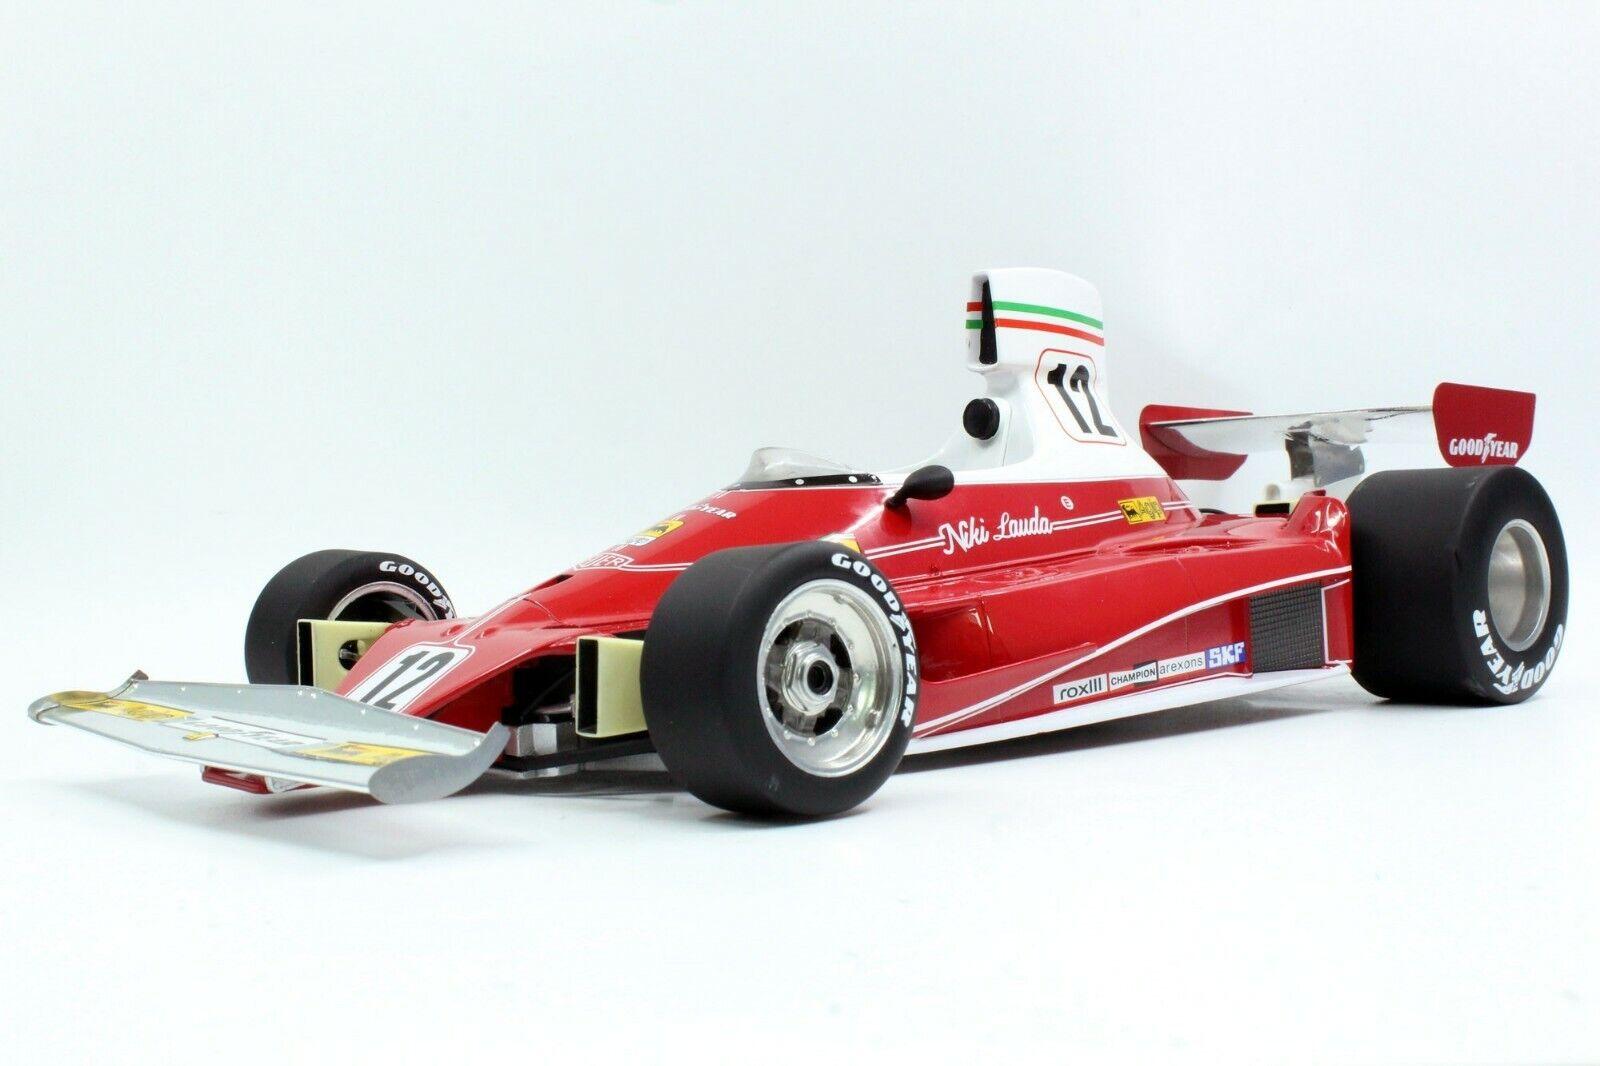 1 12 GP replicas gp1211a 312 T 1975  12 Niki Lauda NuovoScatola Originale